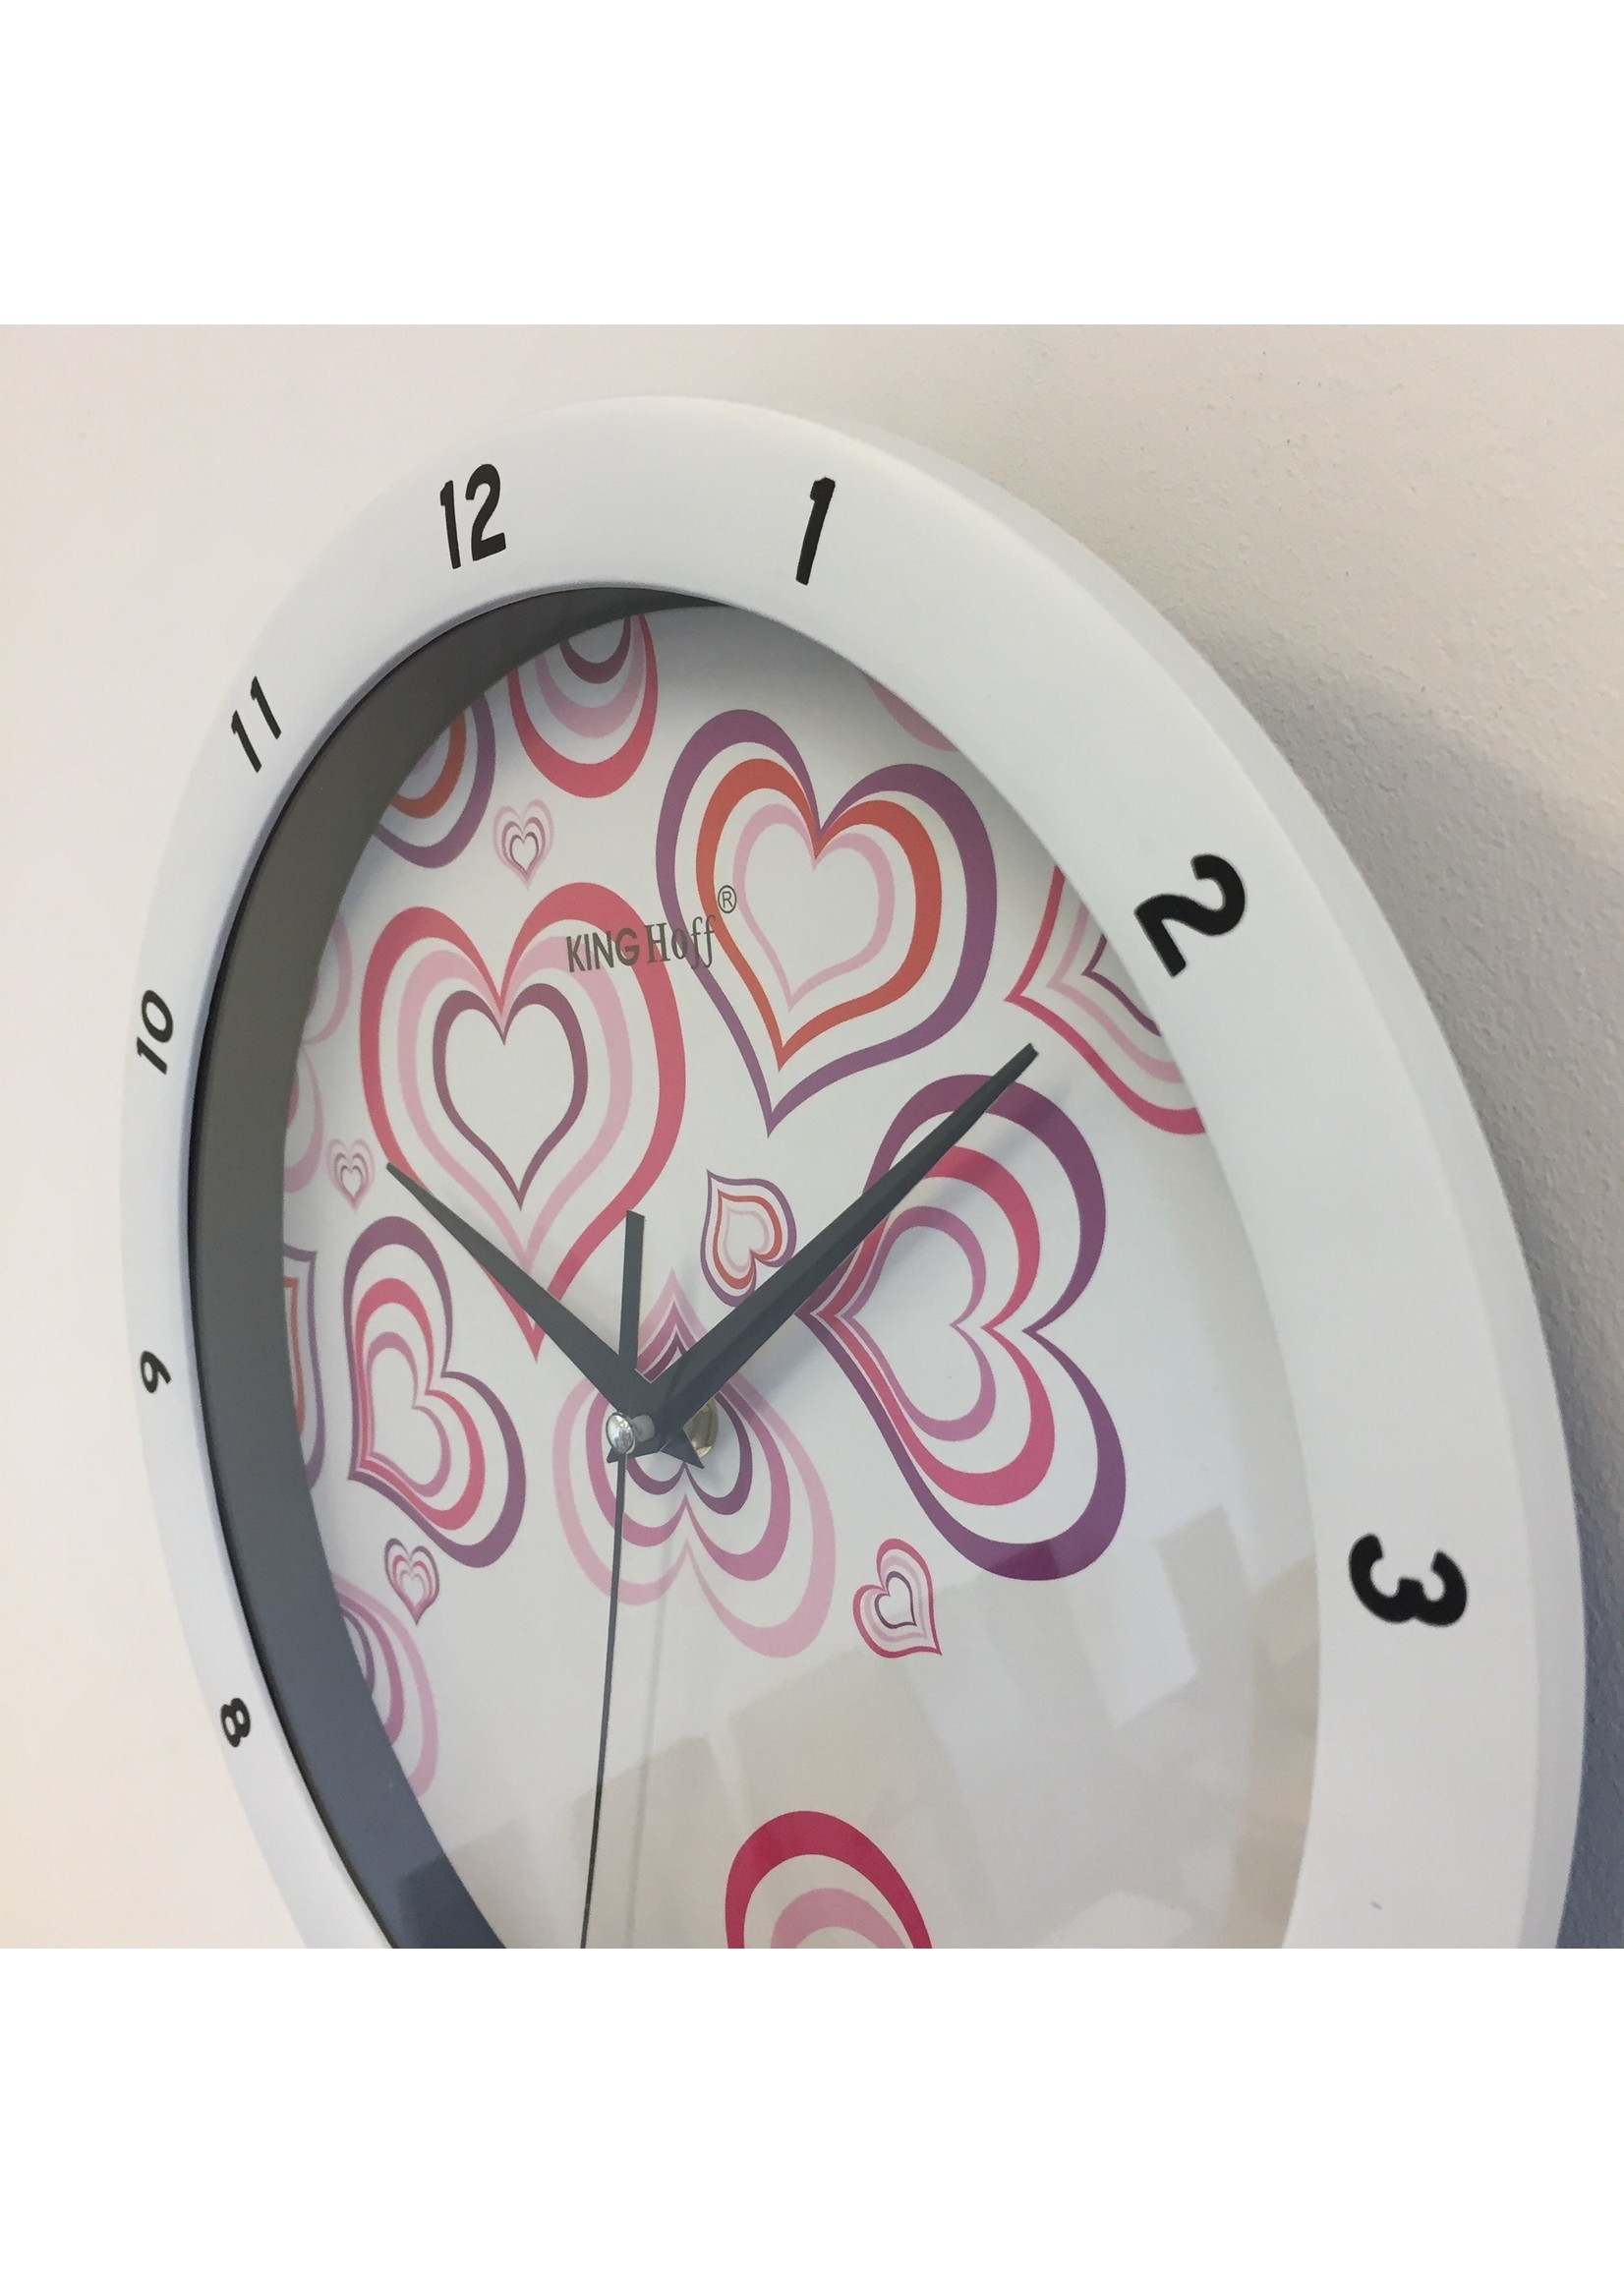 NiceTime Wandklok Purle Heart Modern Design